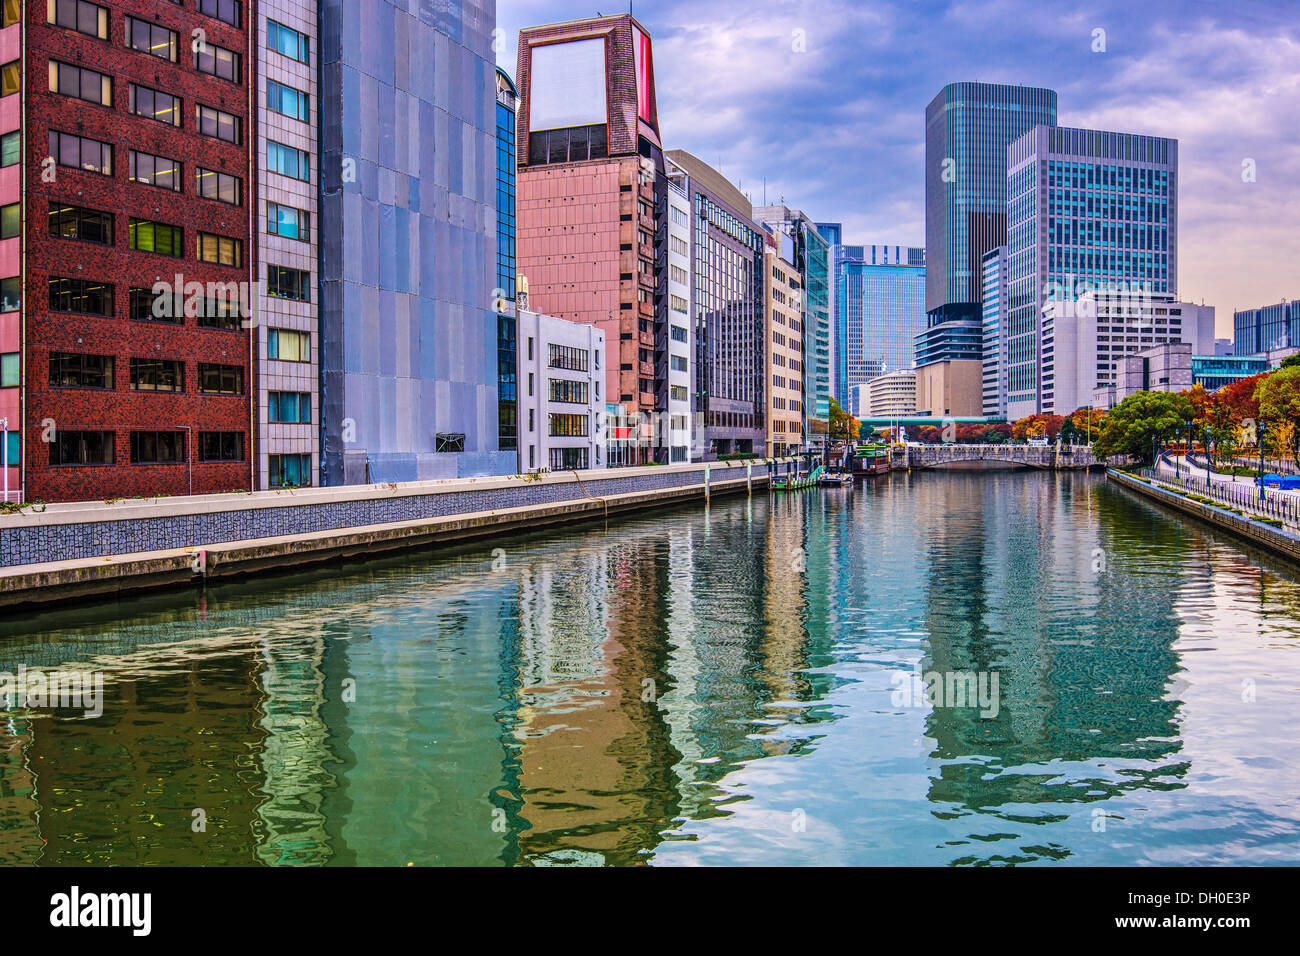 River view in Osaka, Japan. - Stock Image